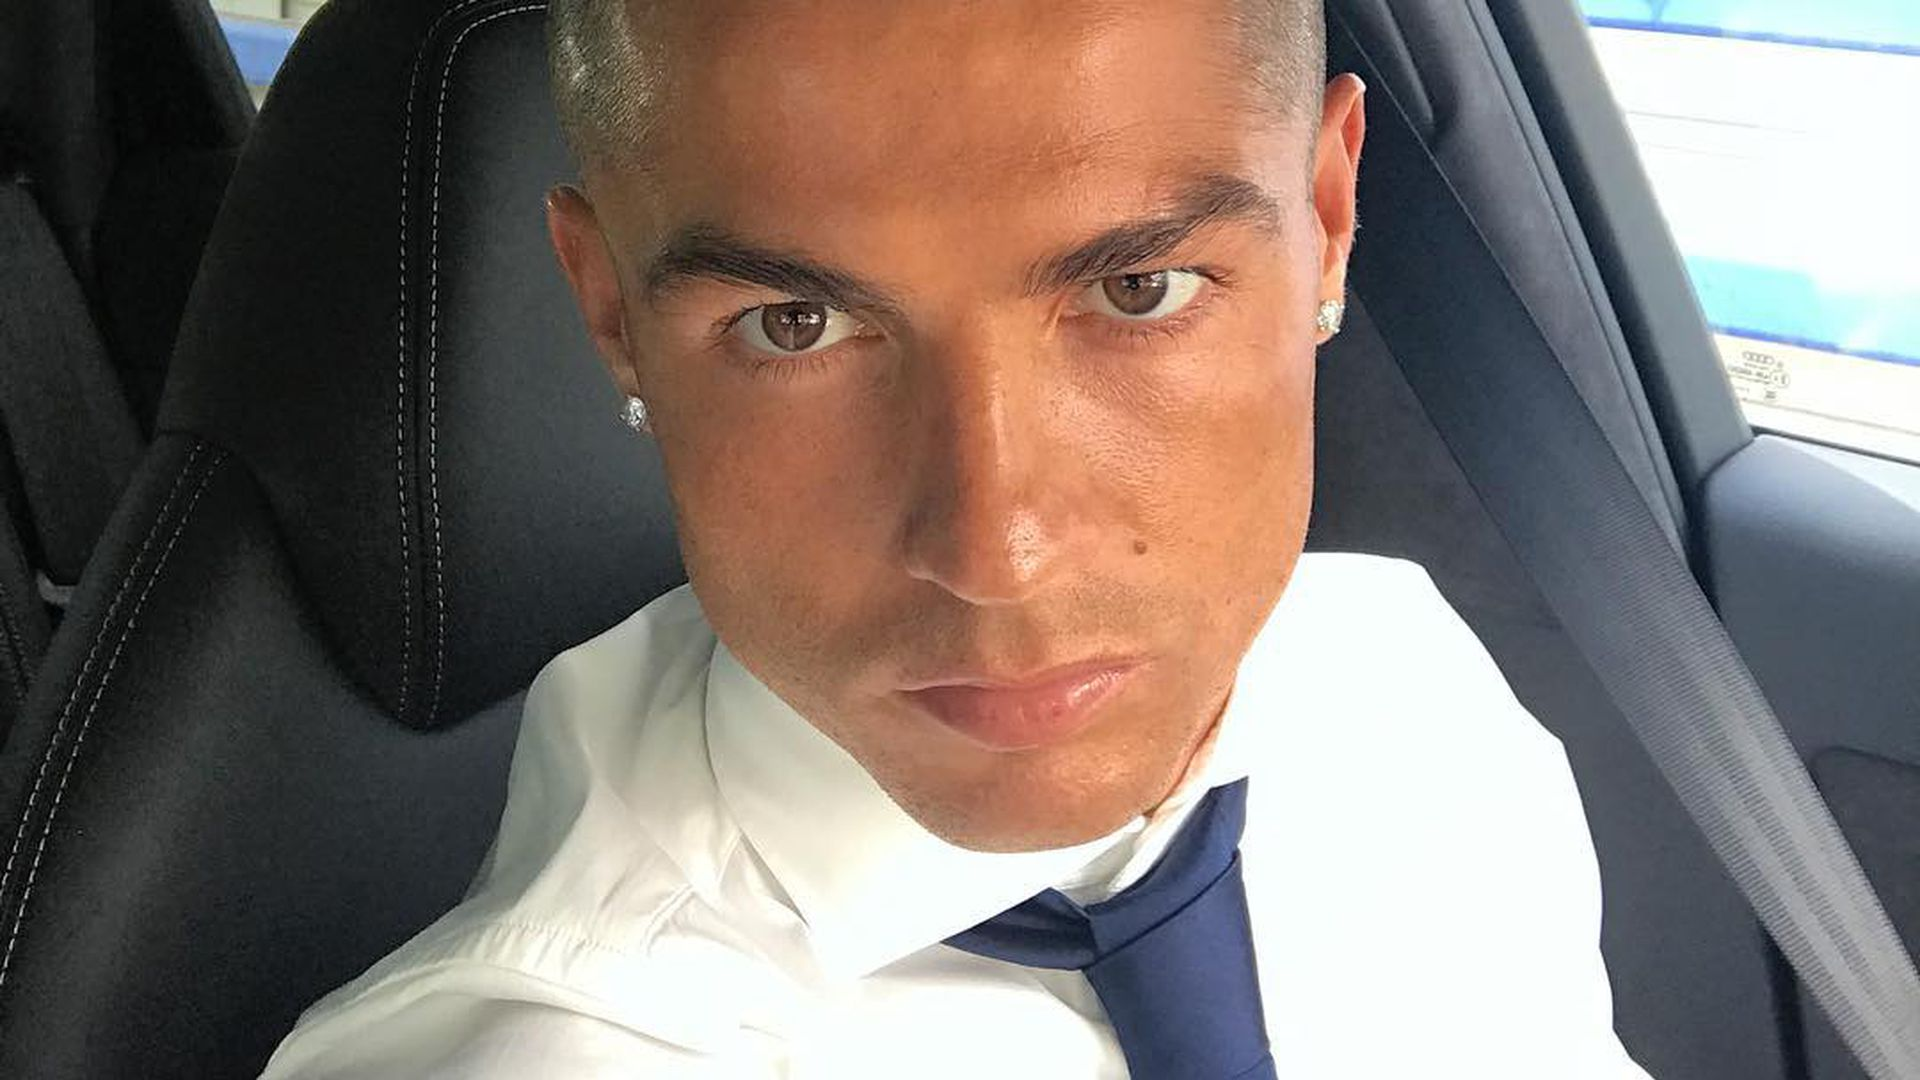 Graue Stoppel Frise Cristiano Ronaldo bist du s wirklich